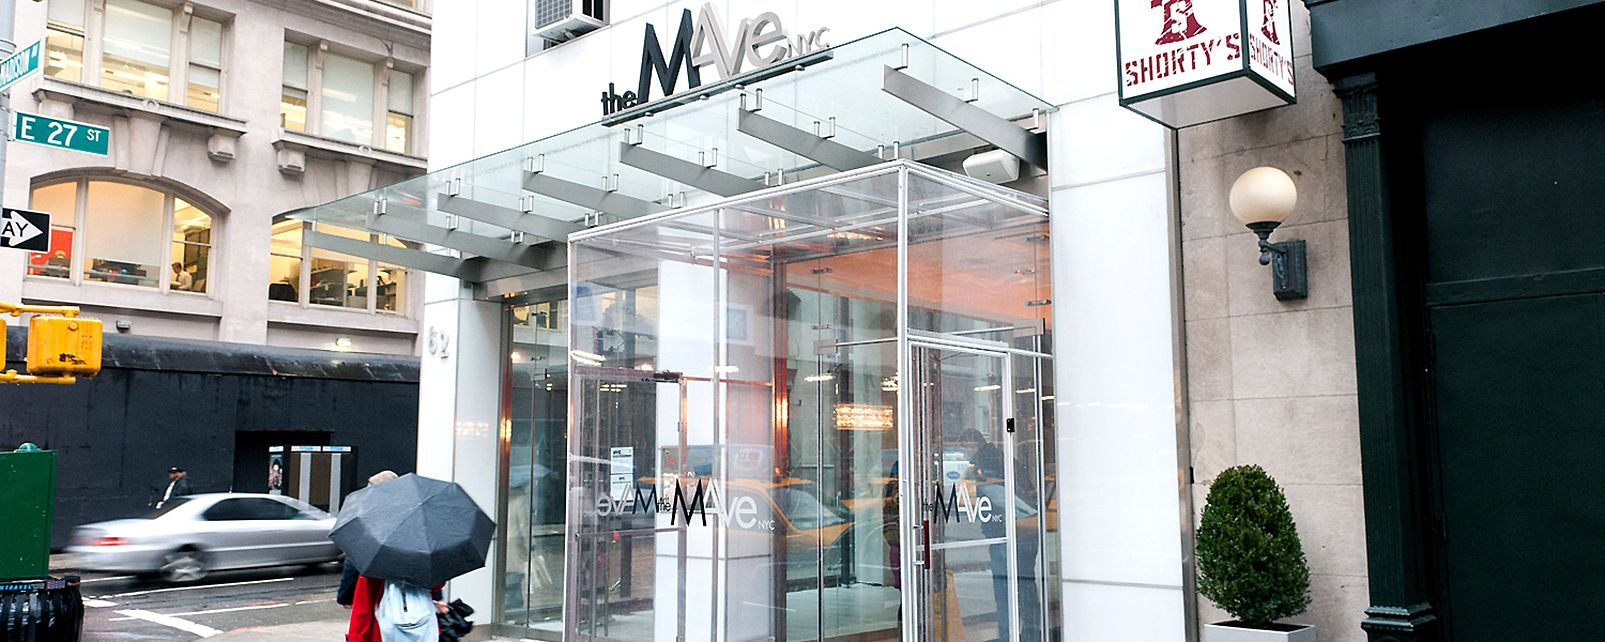 Hotel The MAve nyc